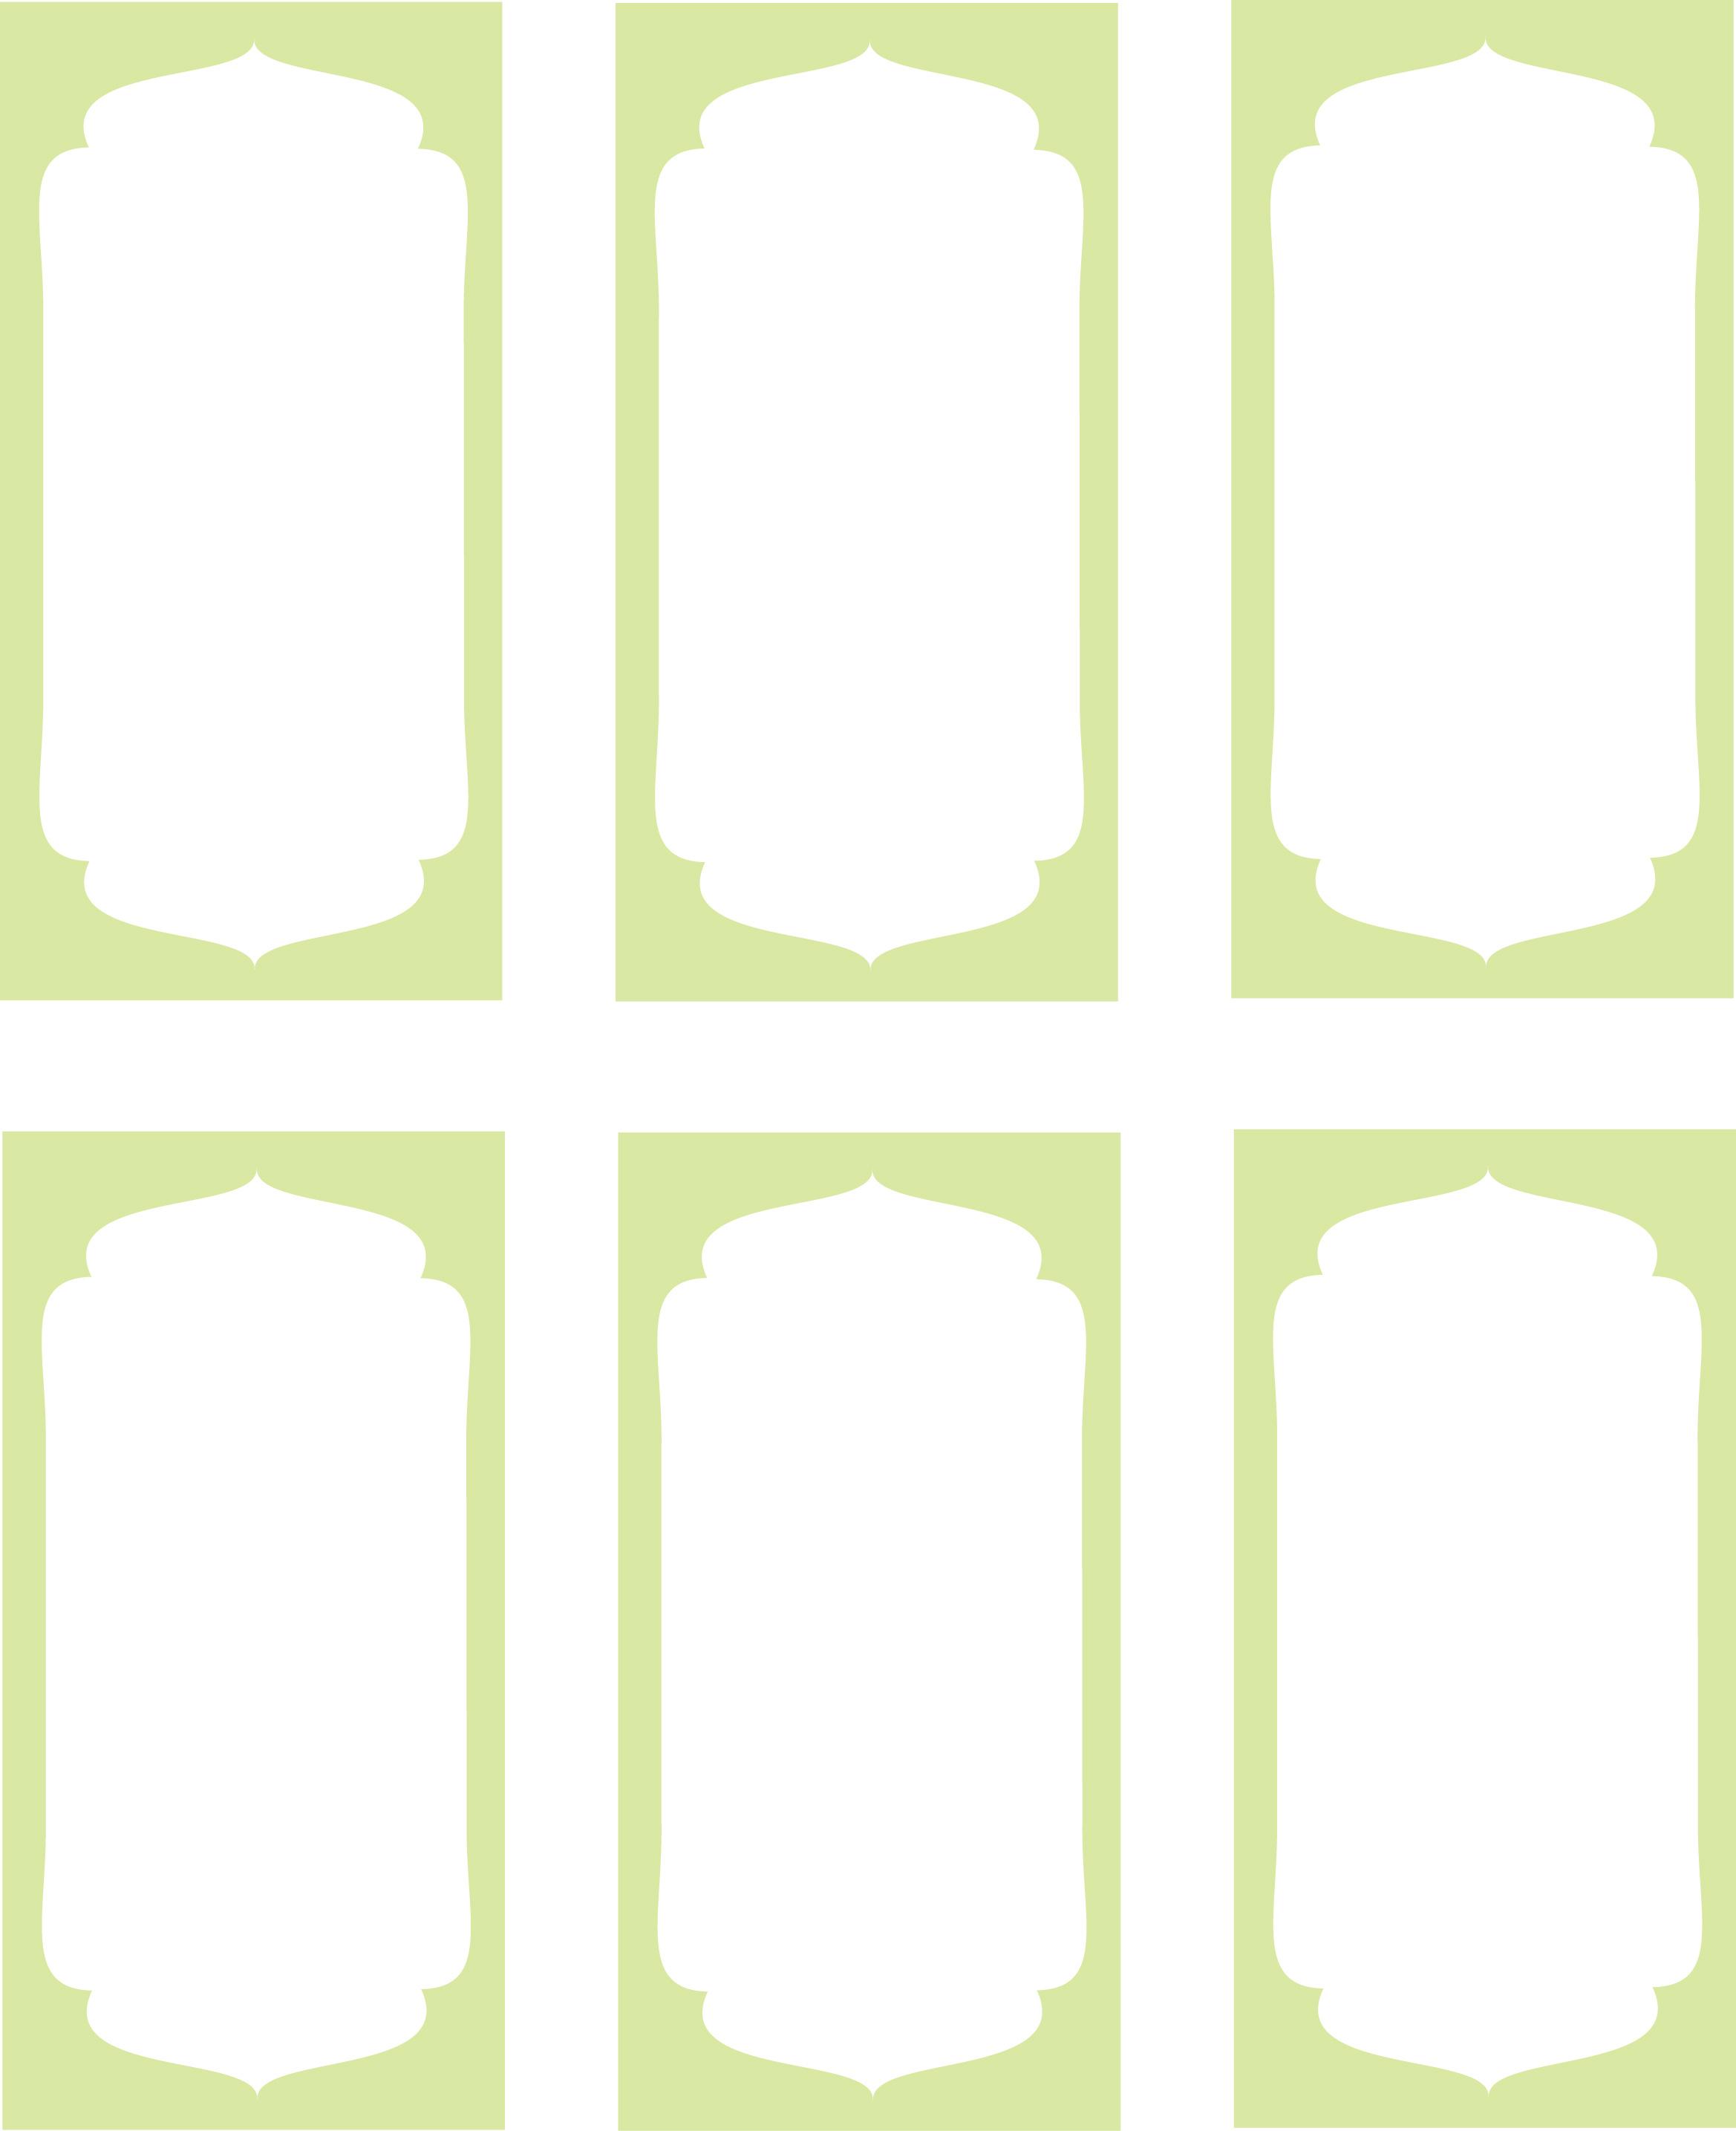 Label Templates - Free Printable Label Templates